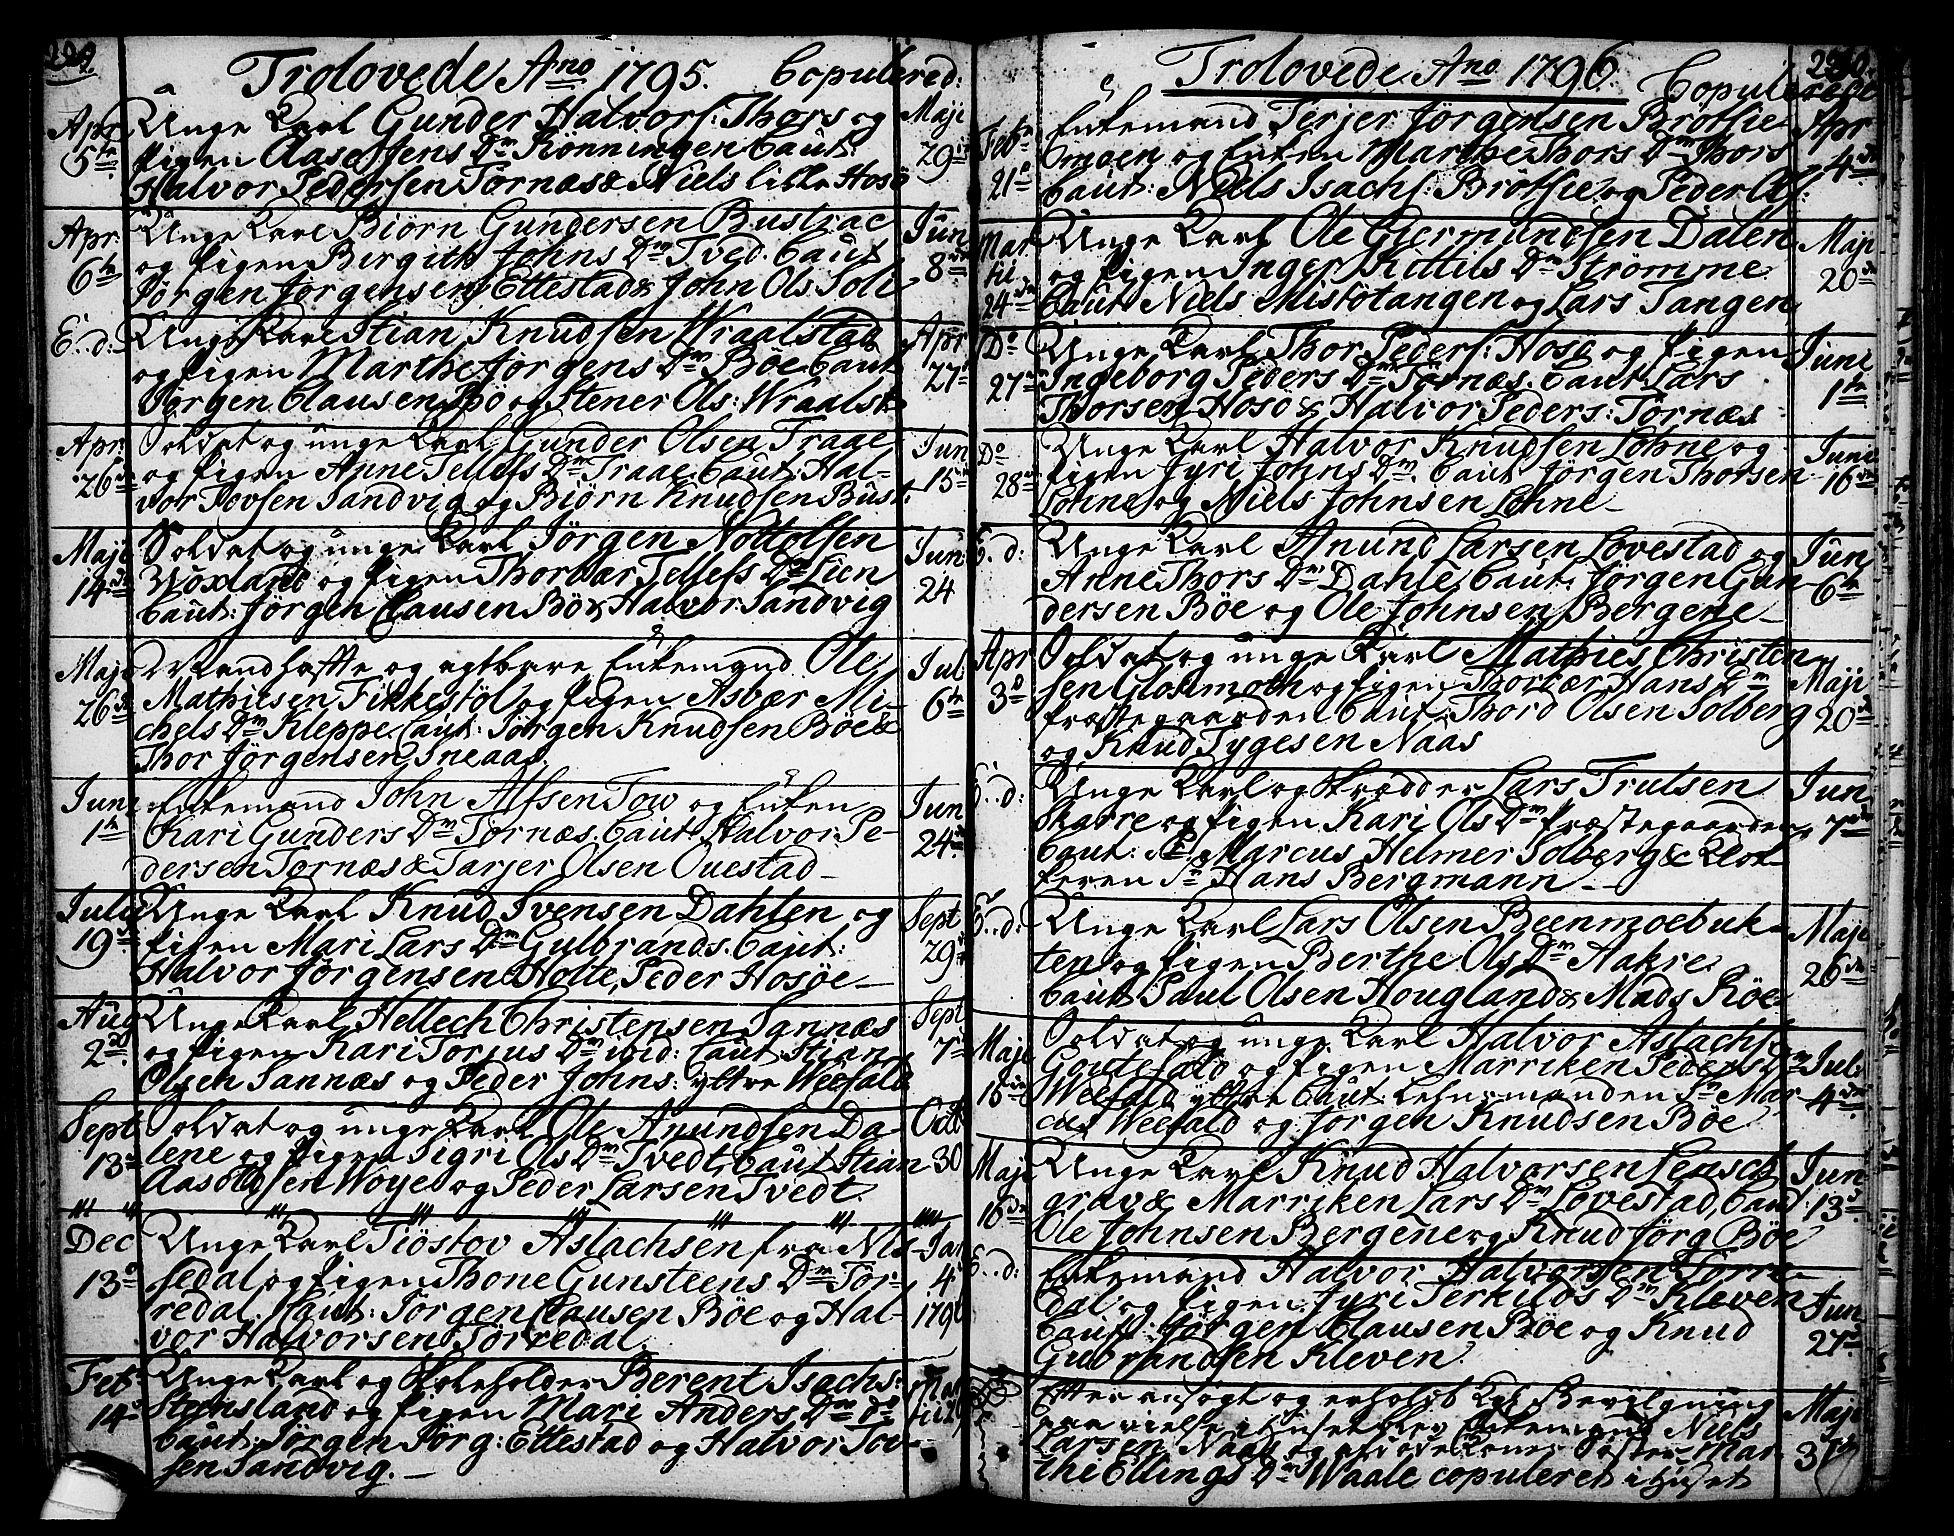 SAKO, Drangedal kirkebøker, F/Fa/L0003: Ministerialbok nr. 3, 1768-1814, s. 229-230